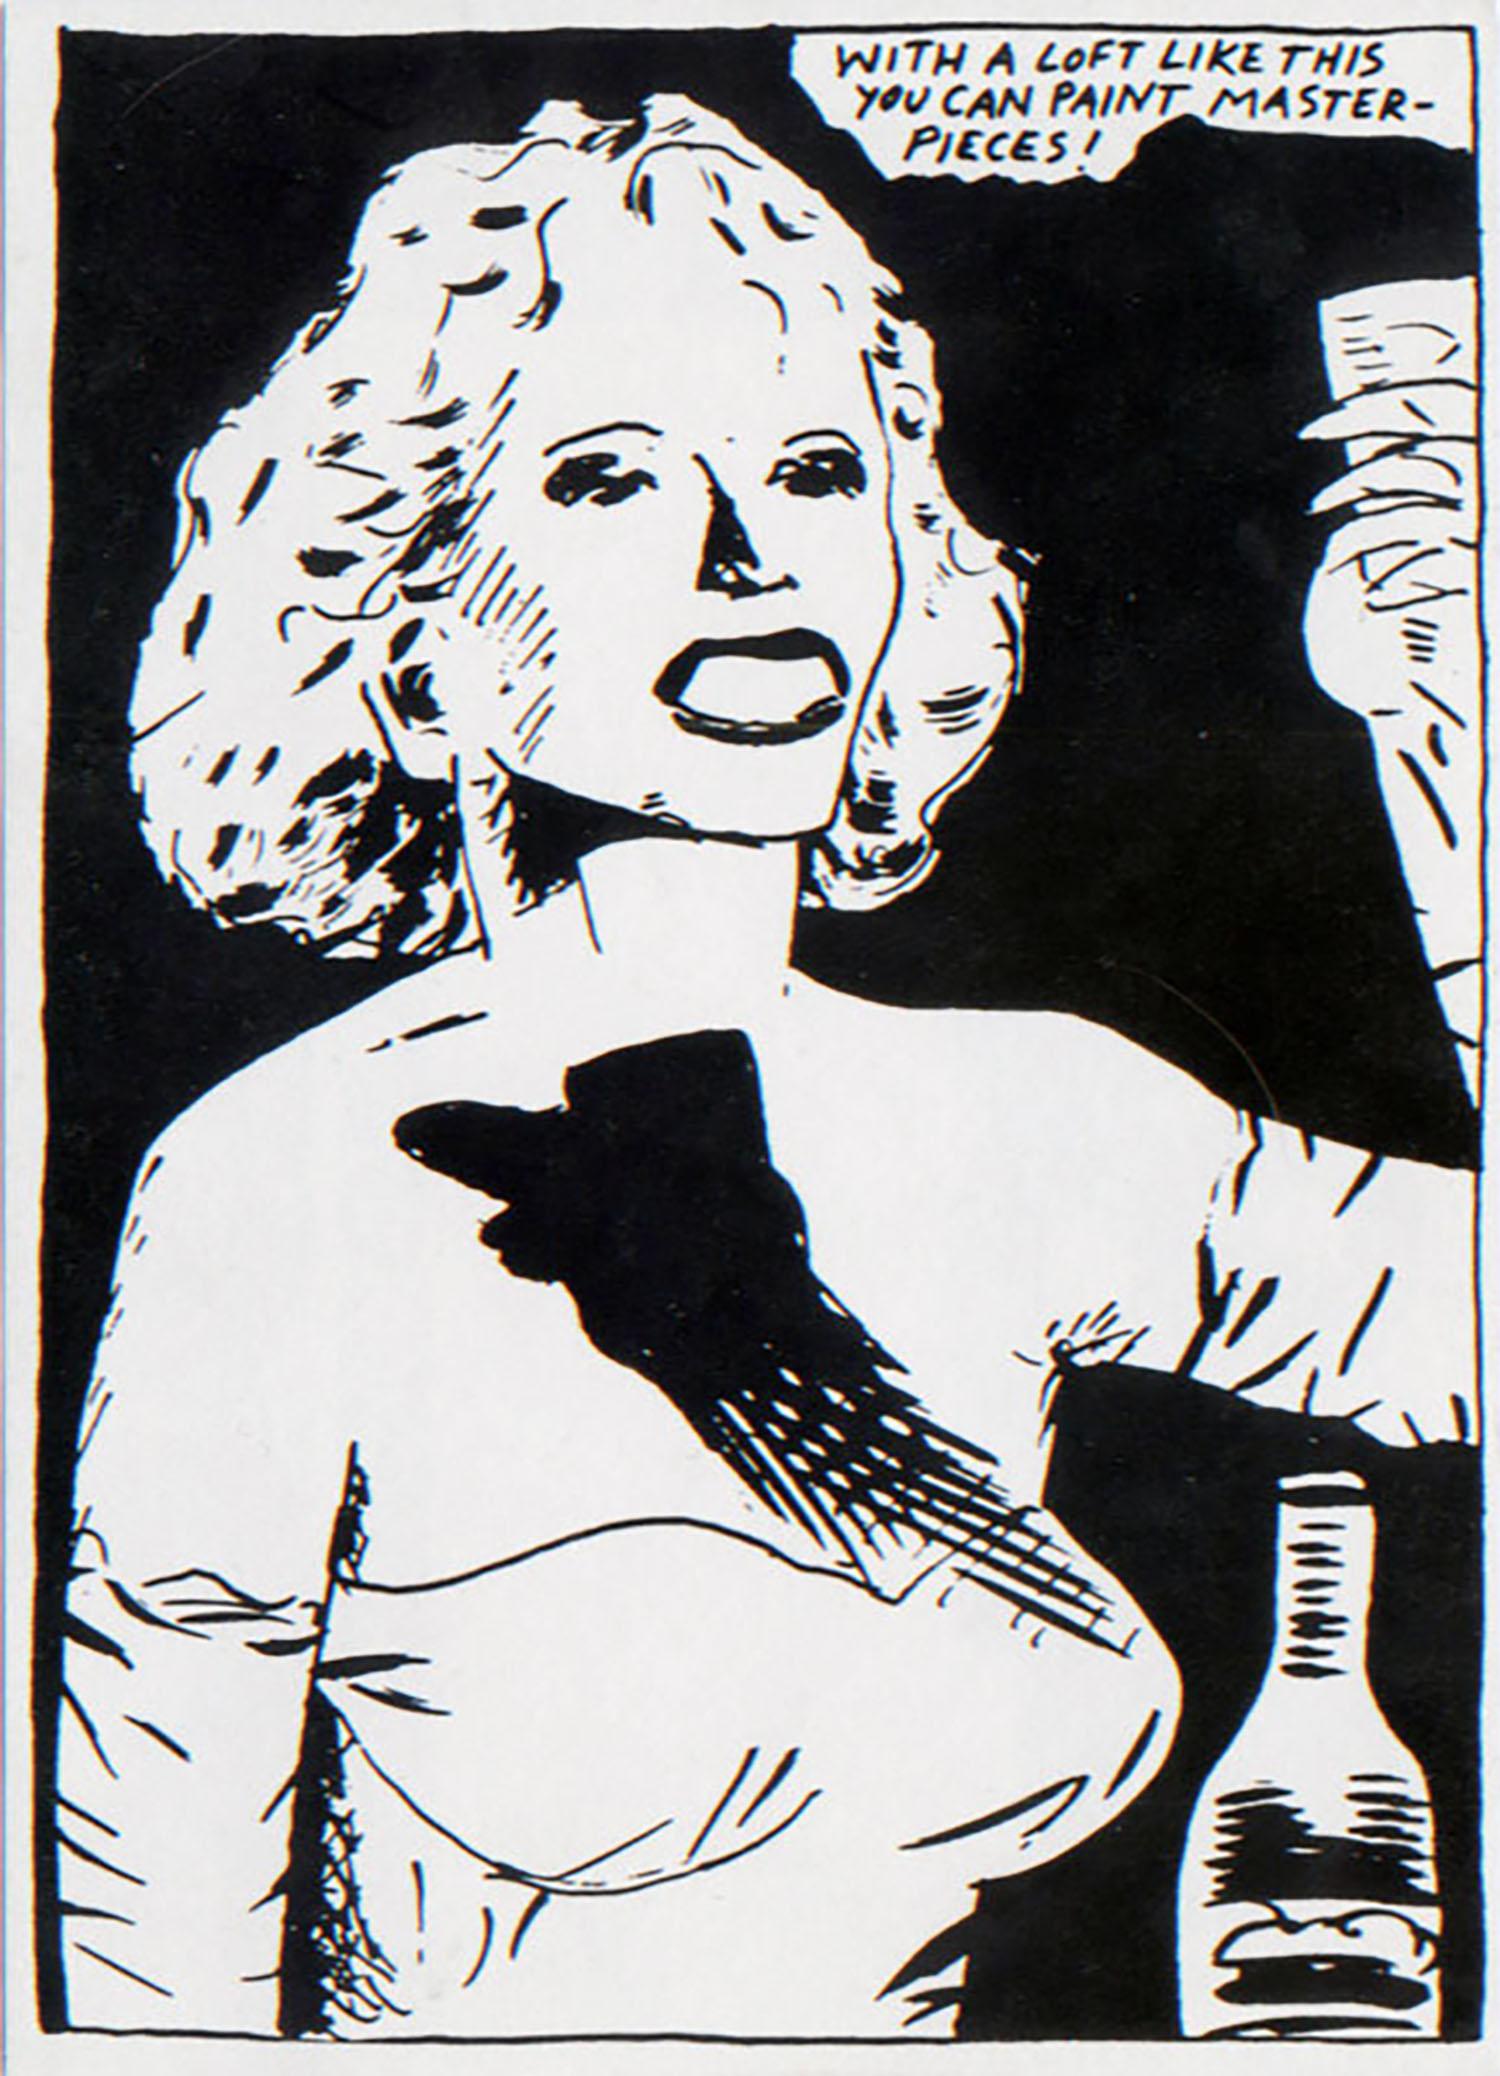 A & P, Raymond Pettibon, Gallery Closing Announcement Card, 1986